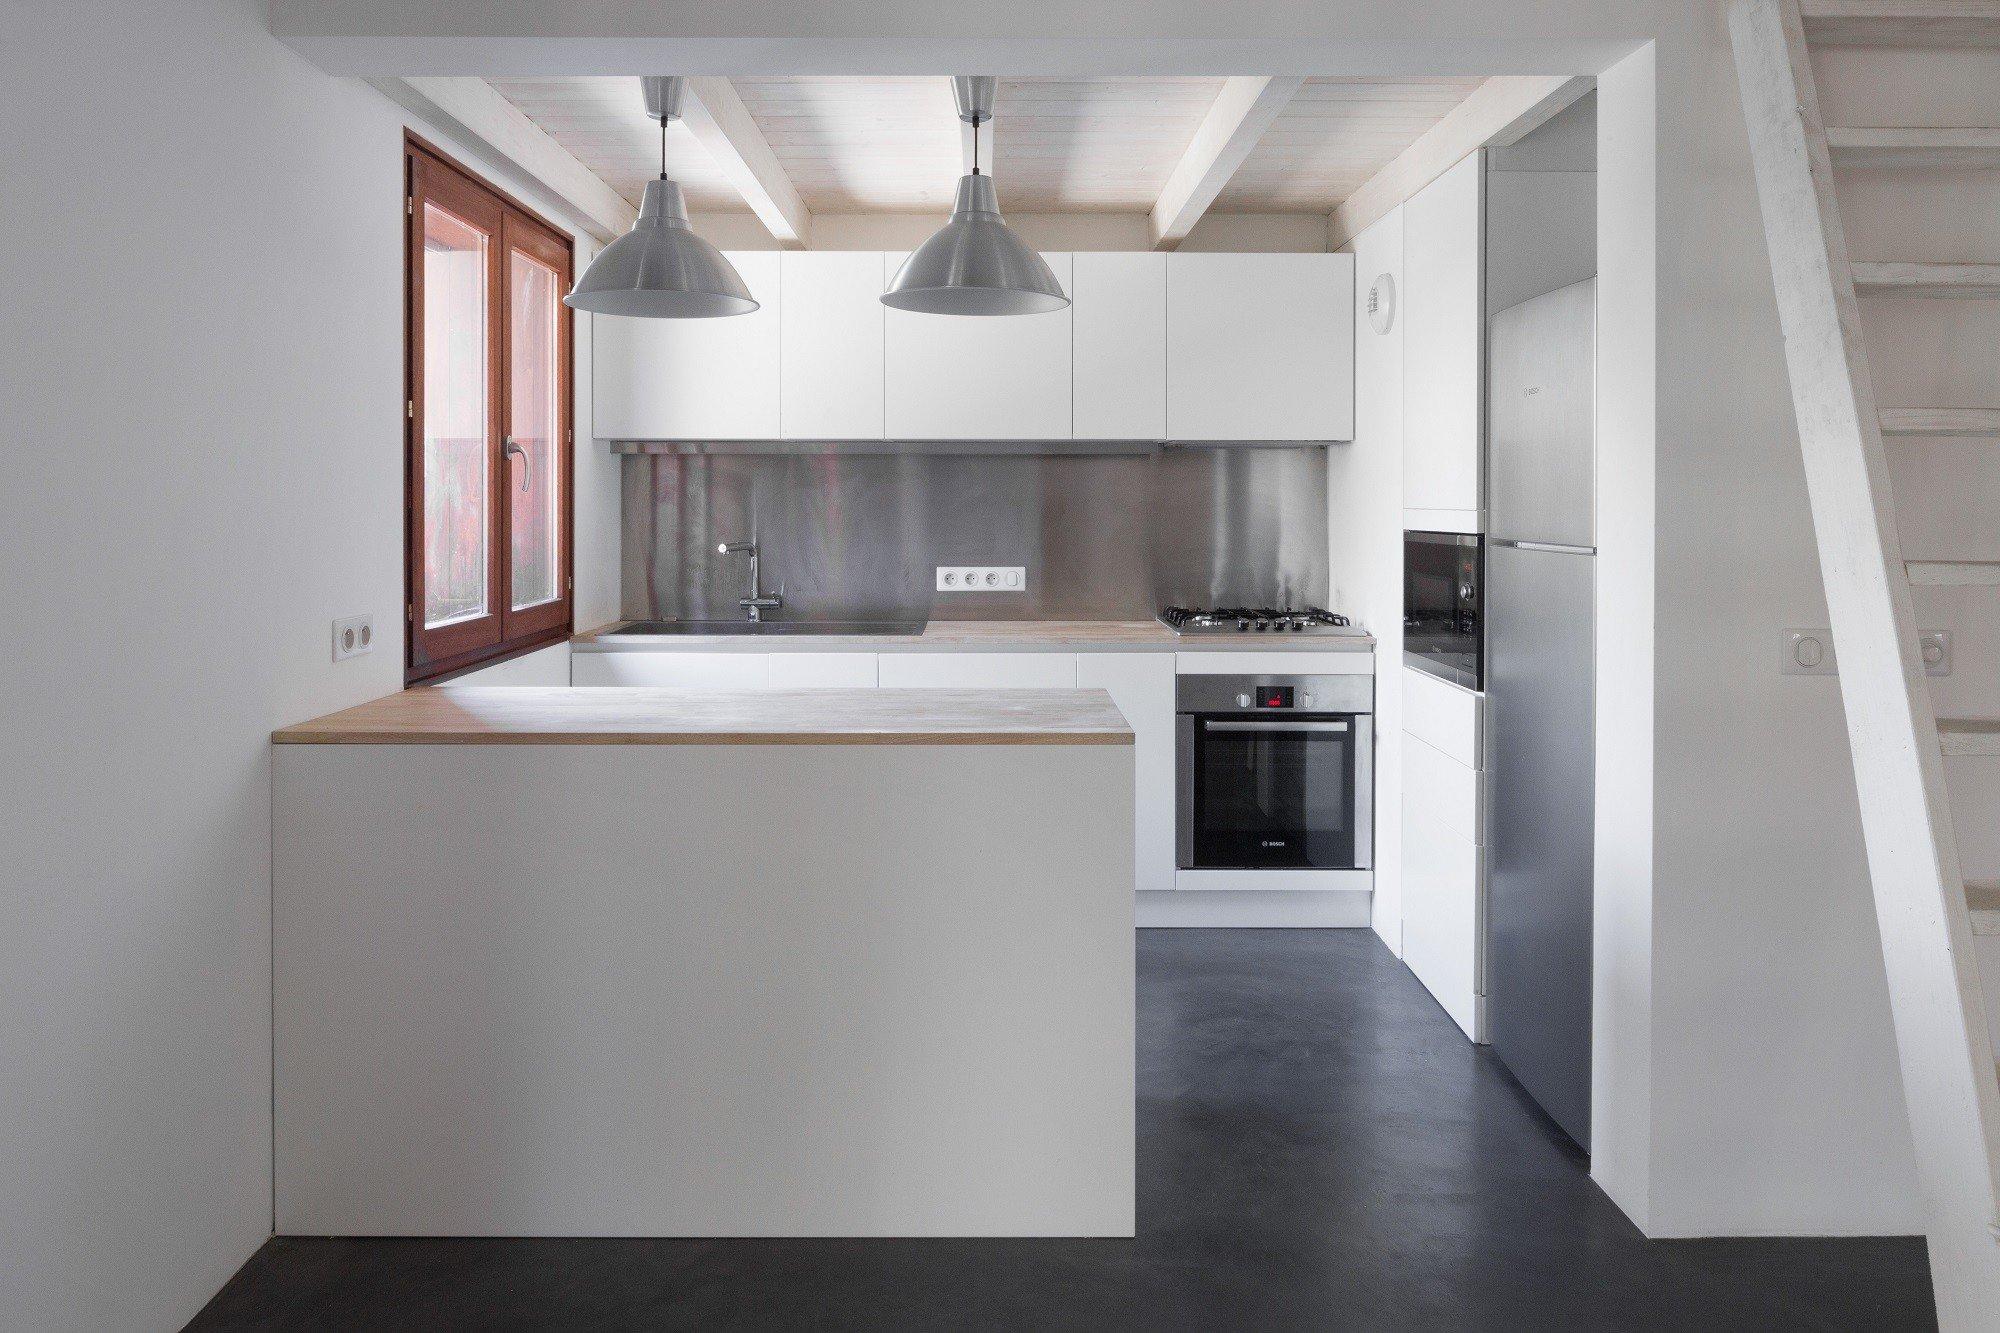 Ferienhaus contemporary vernacular in Conca | Bad und Sanitär ...